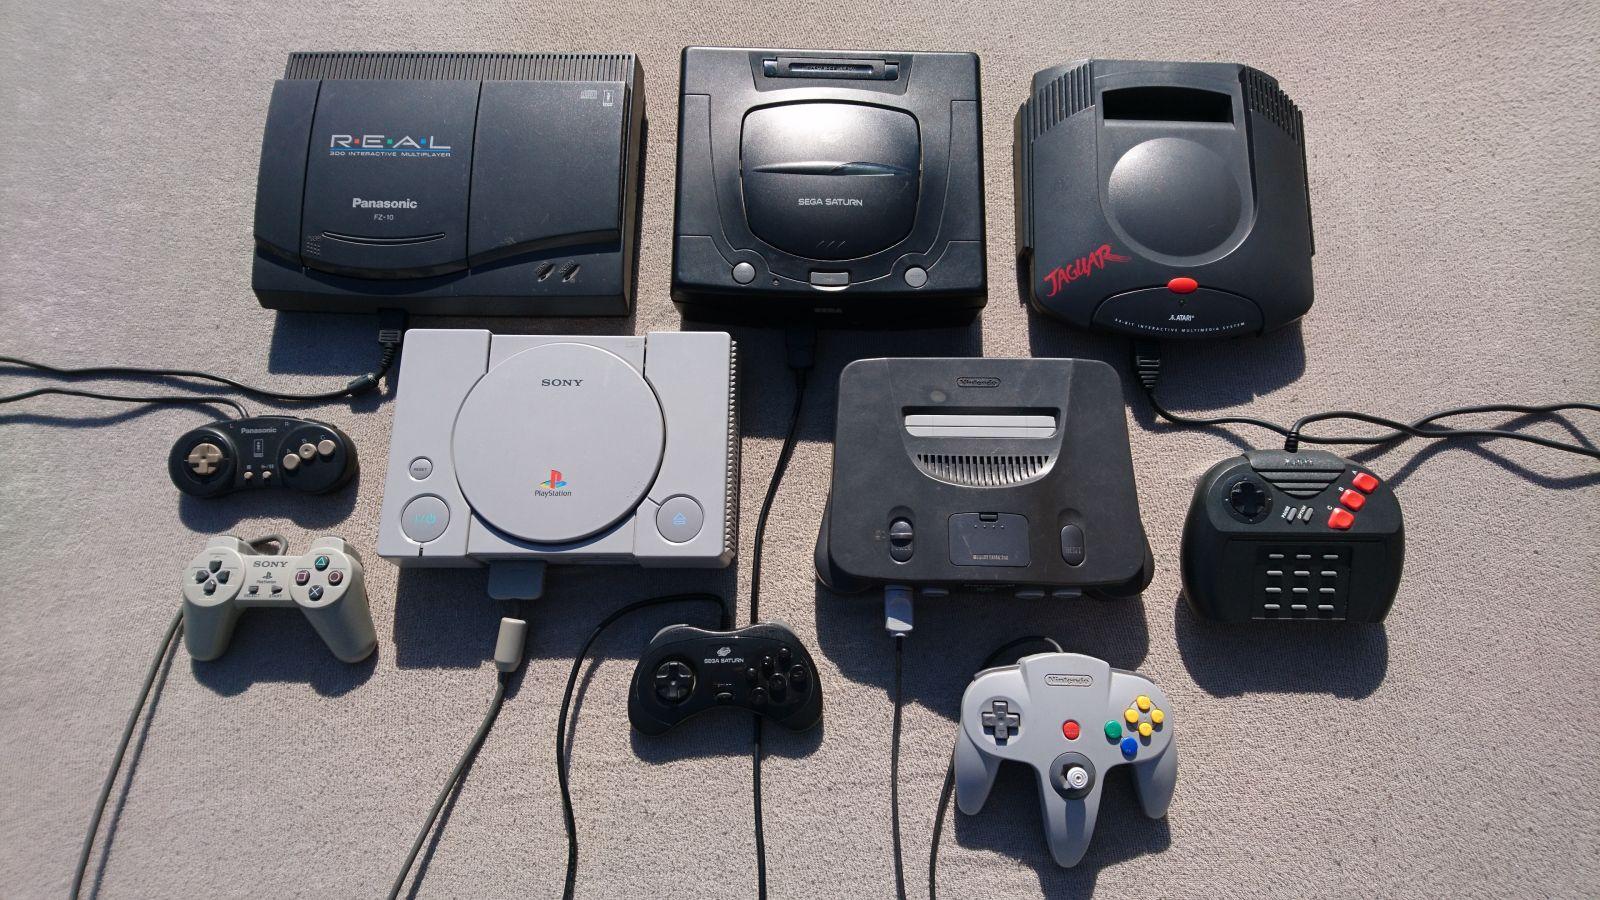 5gen- Panasonic fz-10 3DO, Sega saturn, Atari jaguar, PS1, Nintendo64